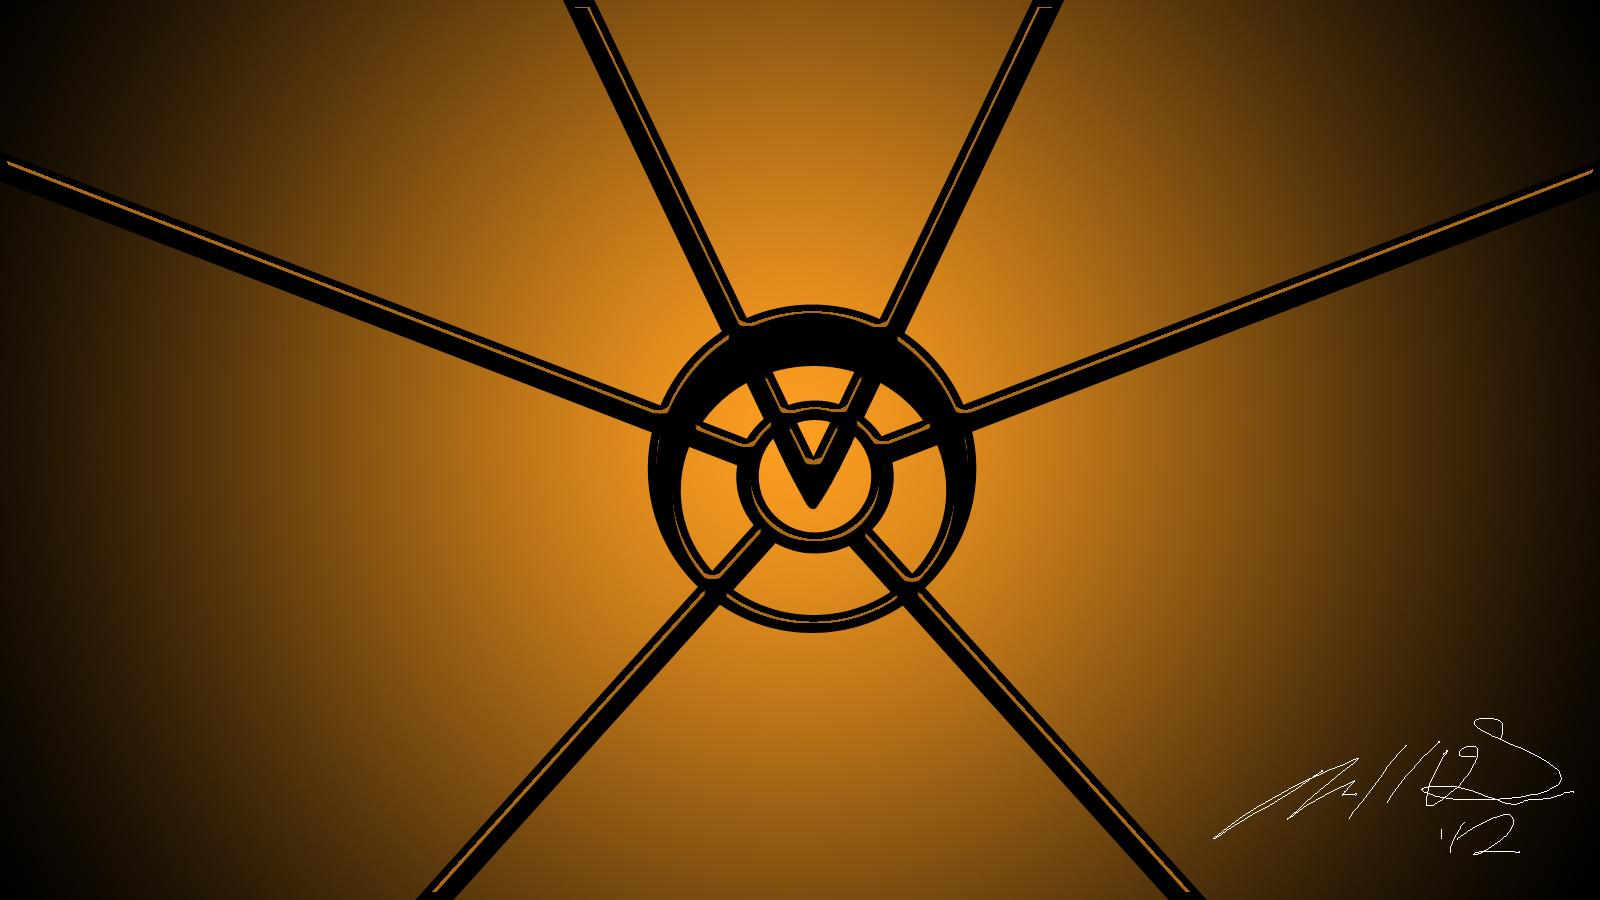 Agent Orange (Orange Lantern Corps) Emblem Design by ...Orange Lantern Corps Logo